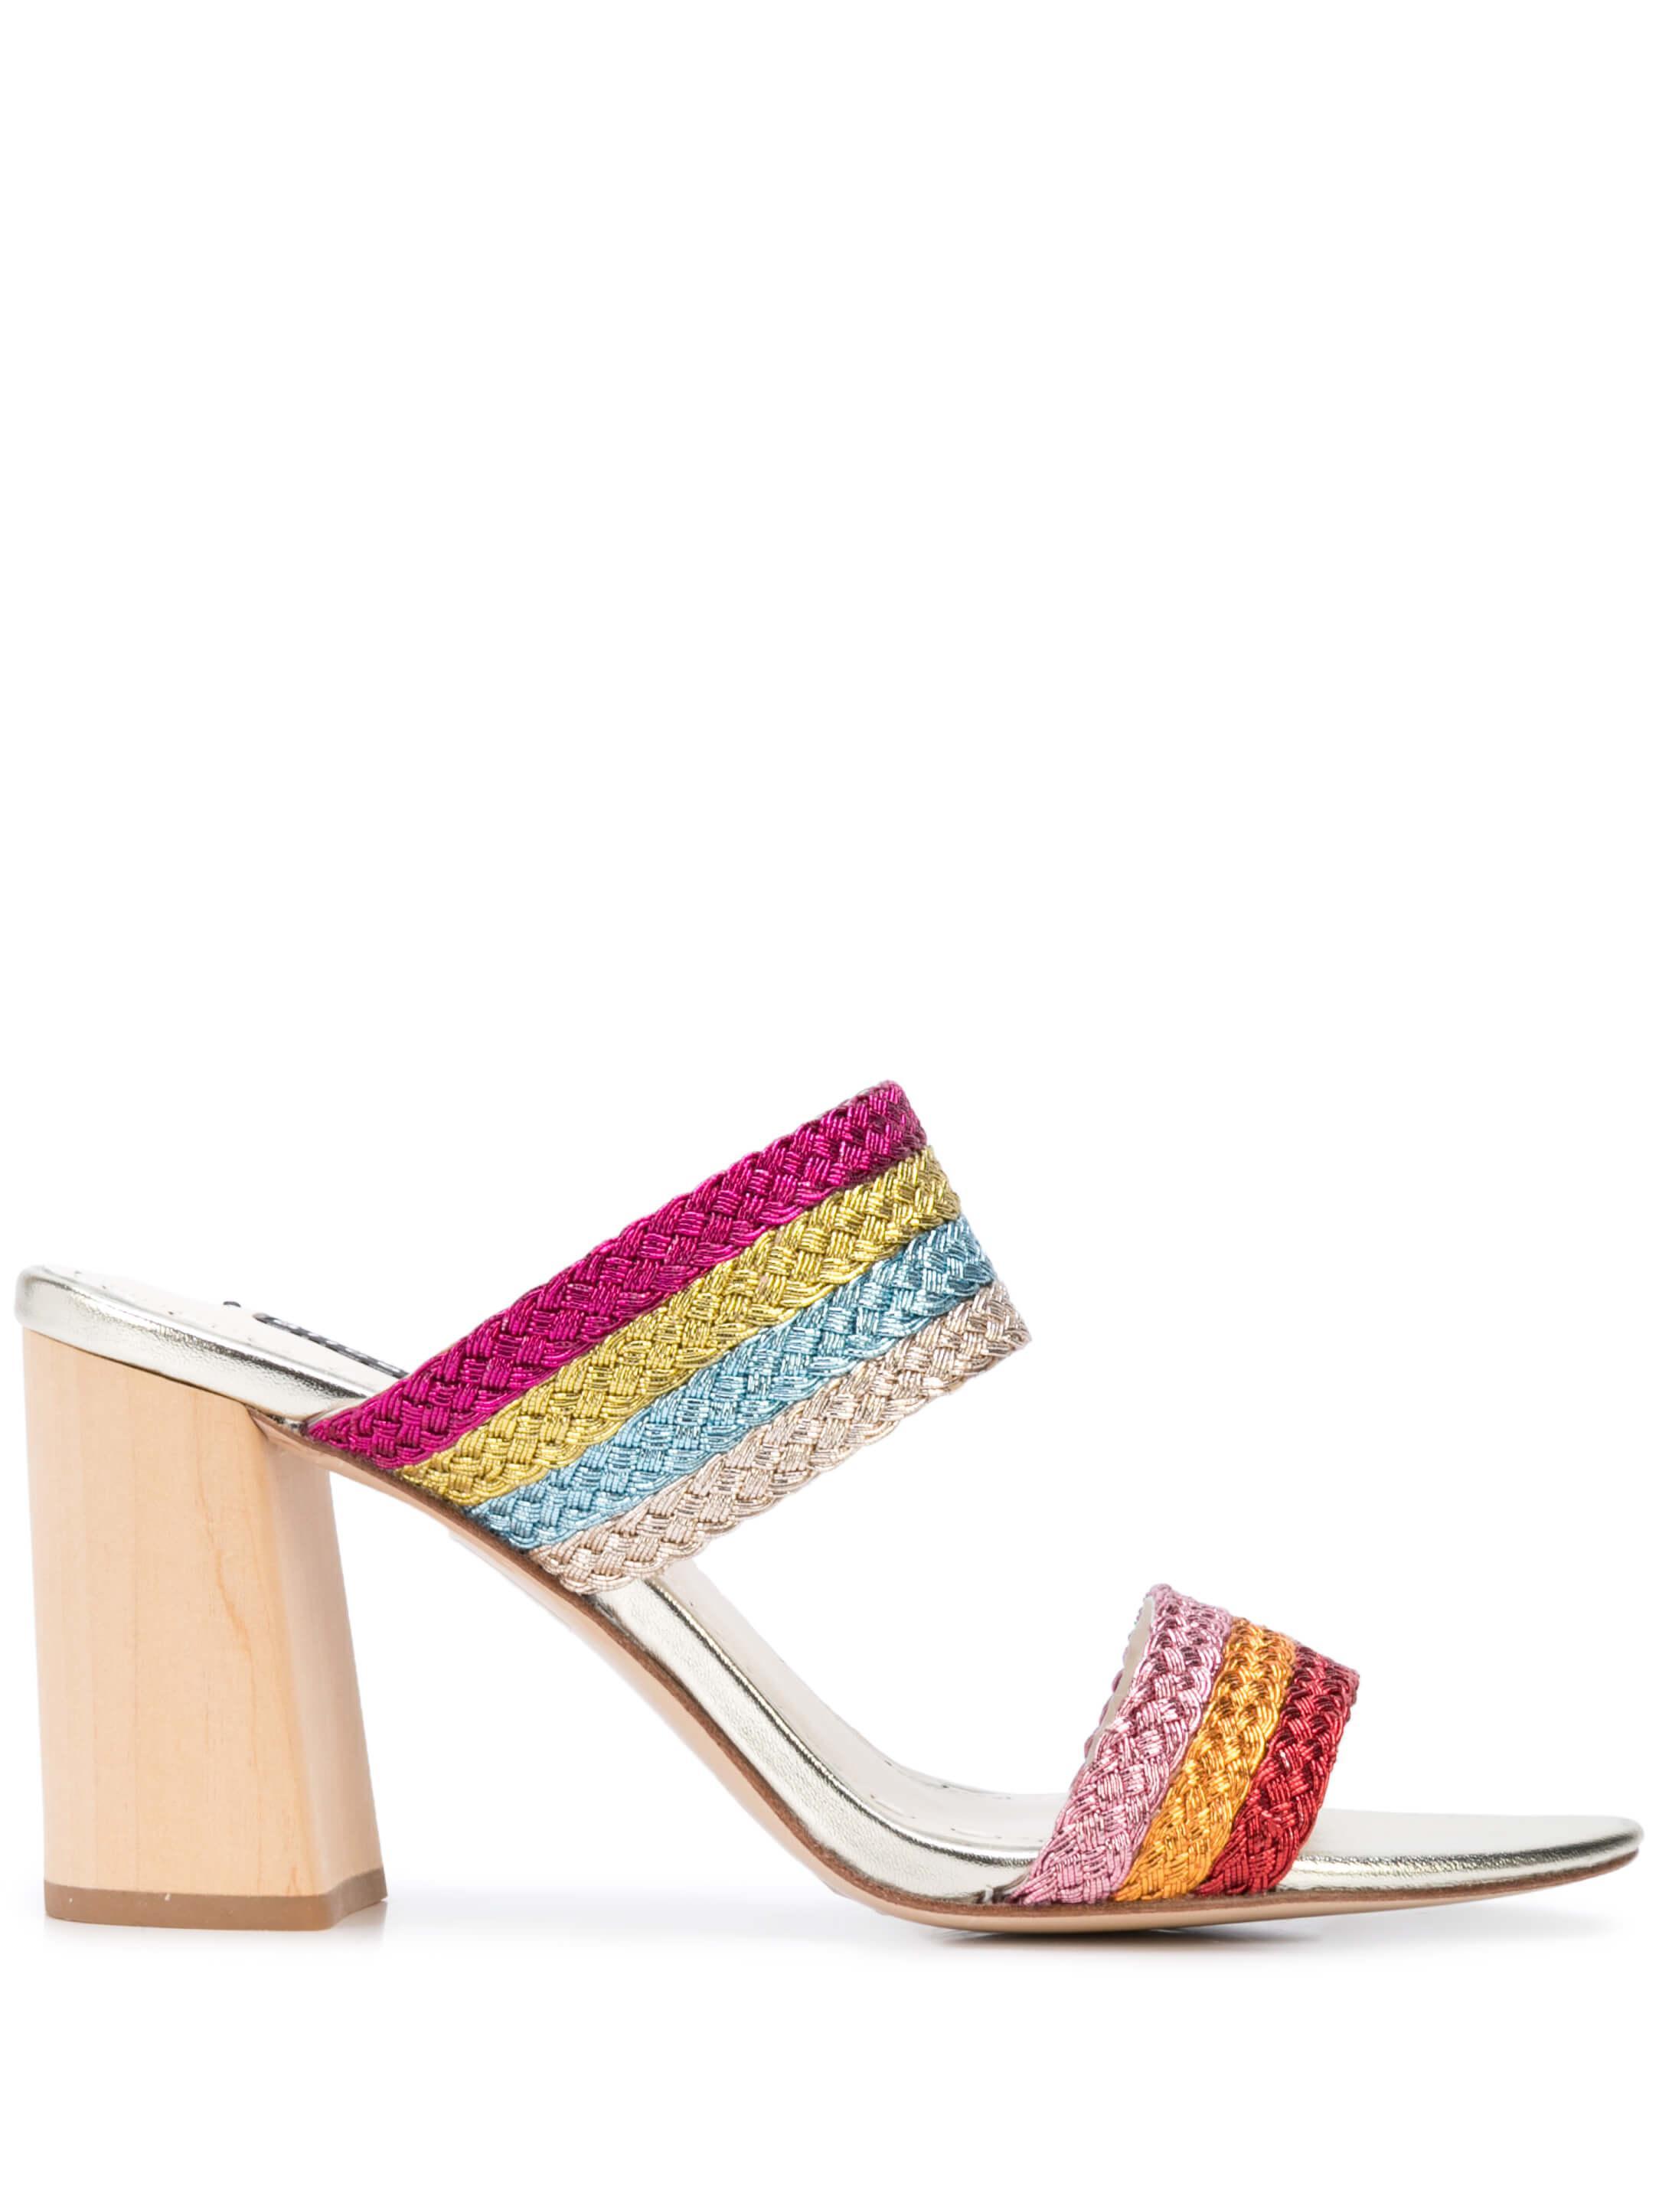 Multicolor Two Strap Block Heel Item # LONI